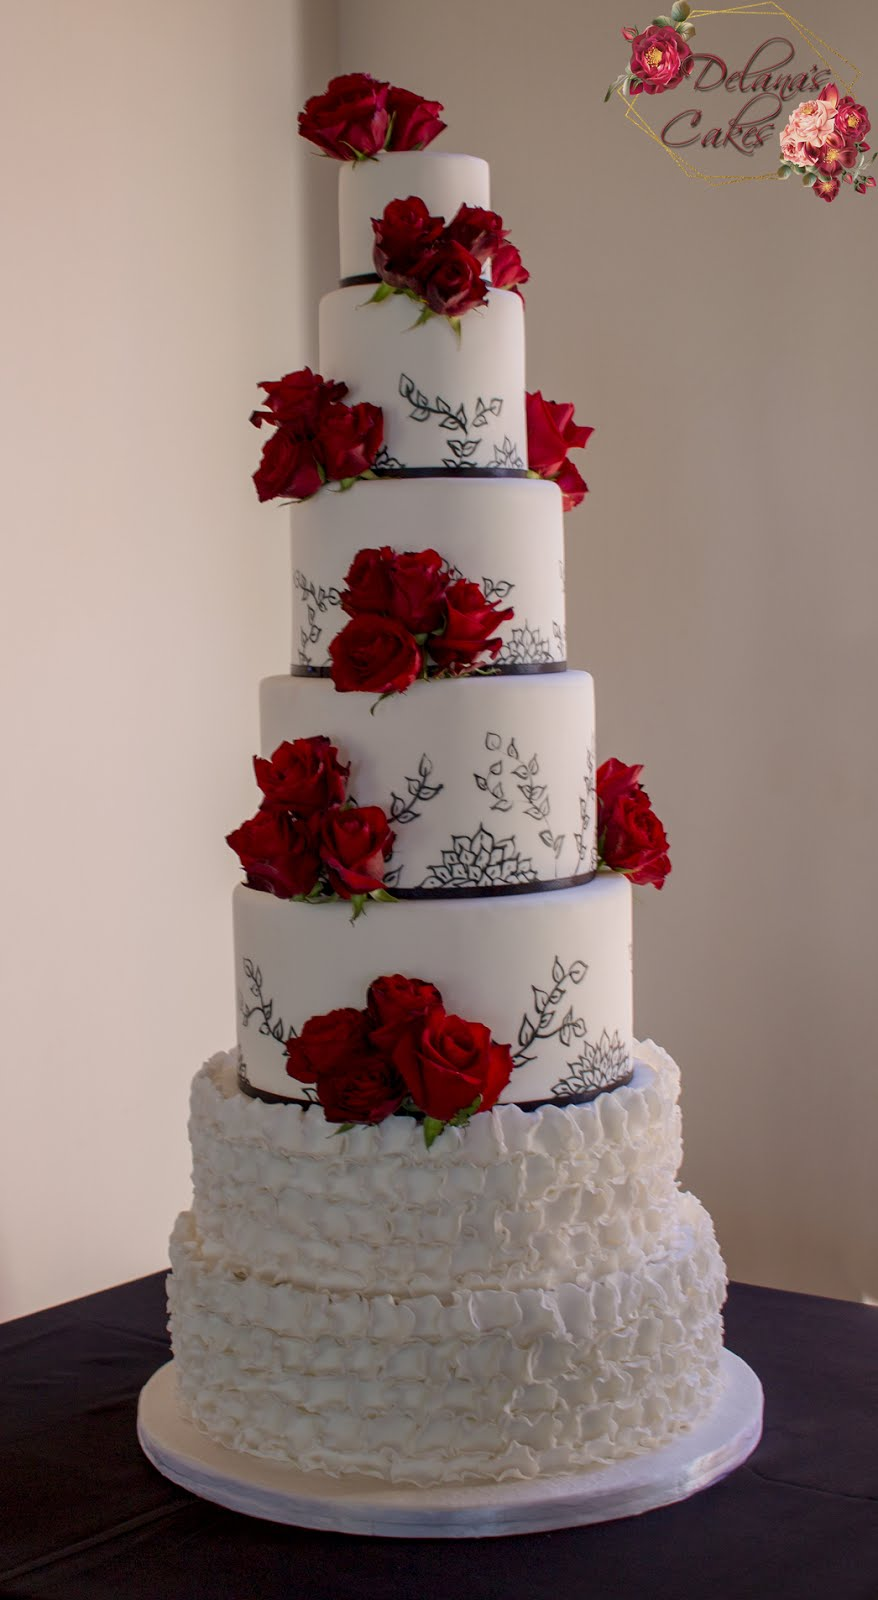 Delana S Cakes 7 Tier Wedding Cake At Hoogeind Manor